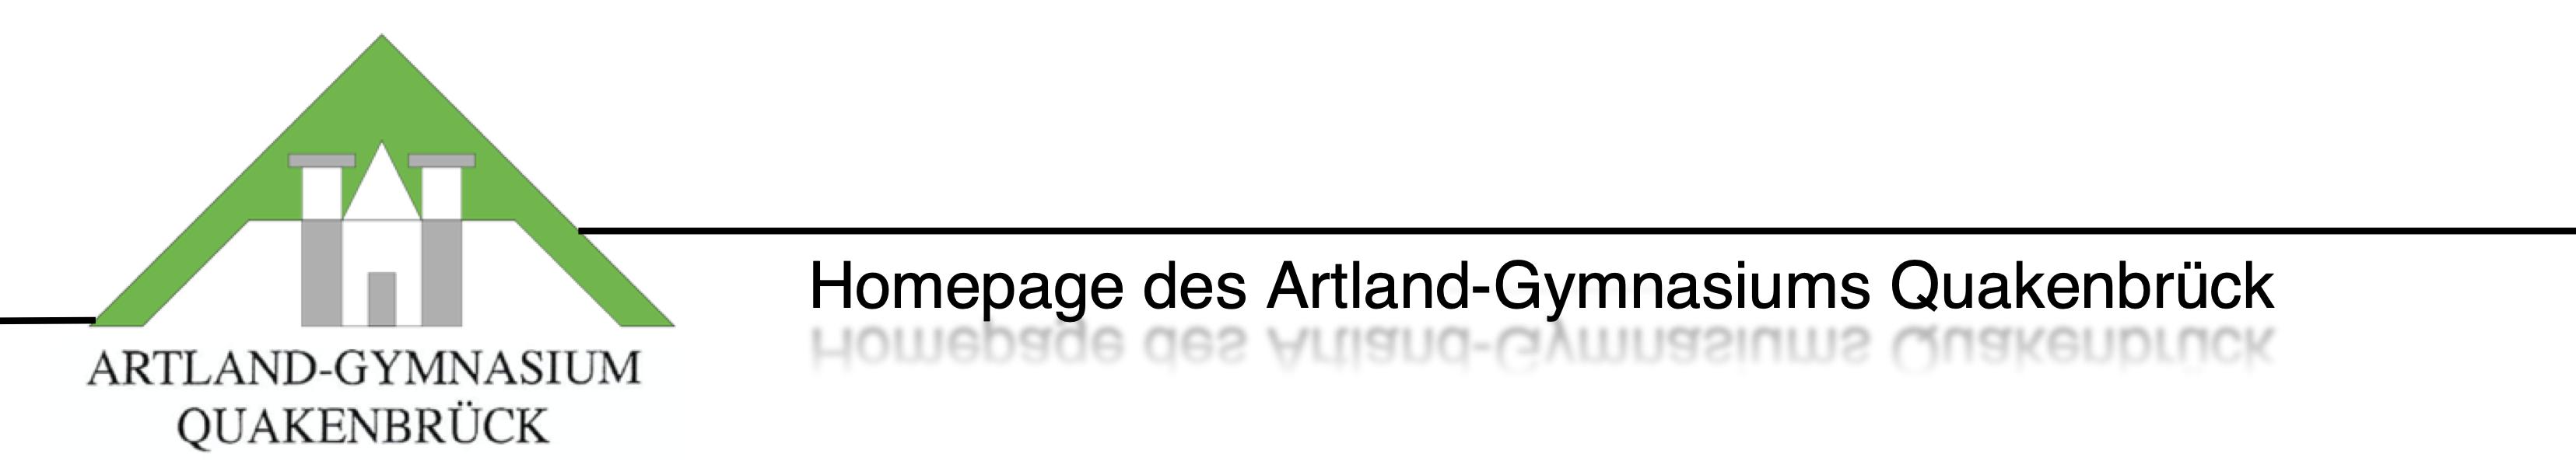 Artland-Gymnasium Quakenbrück